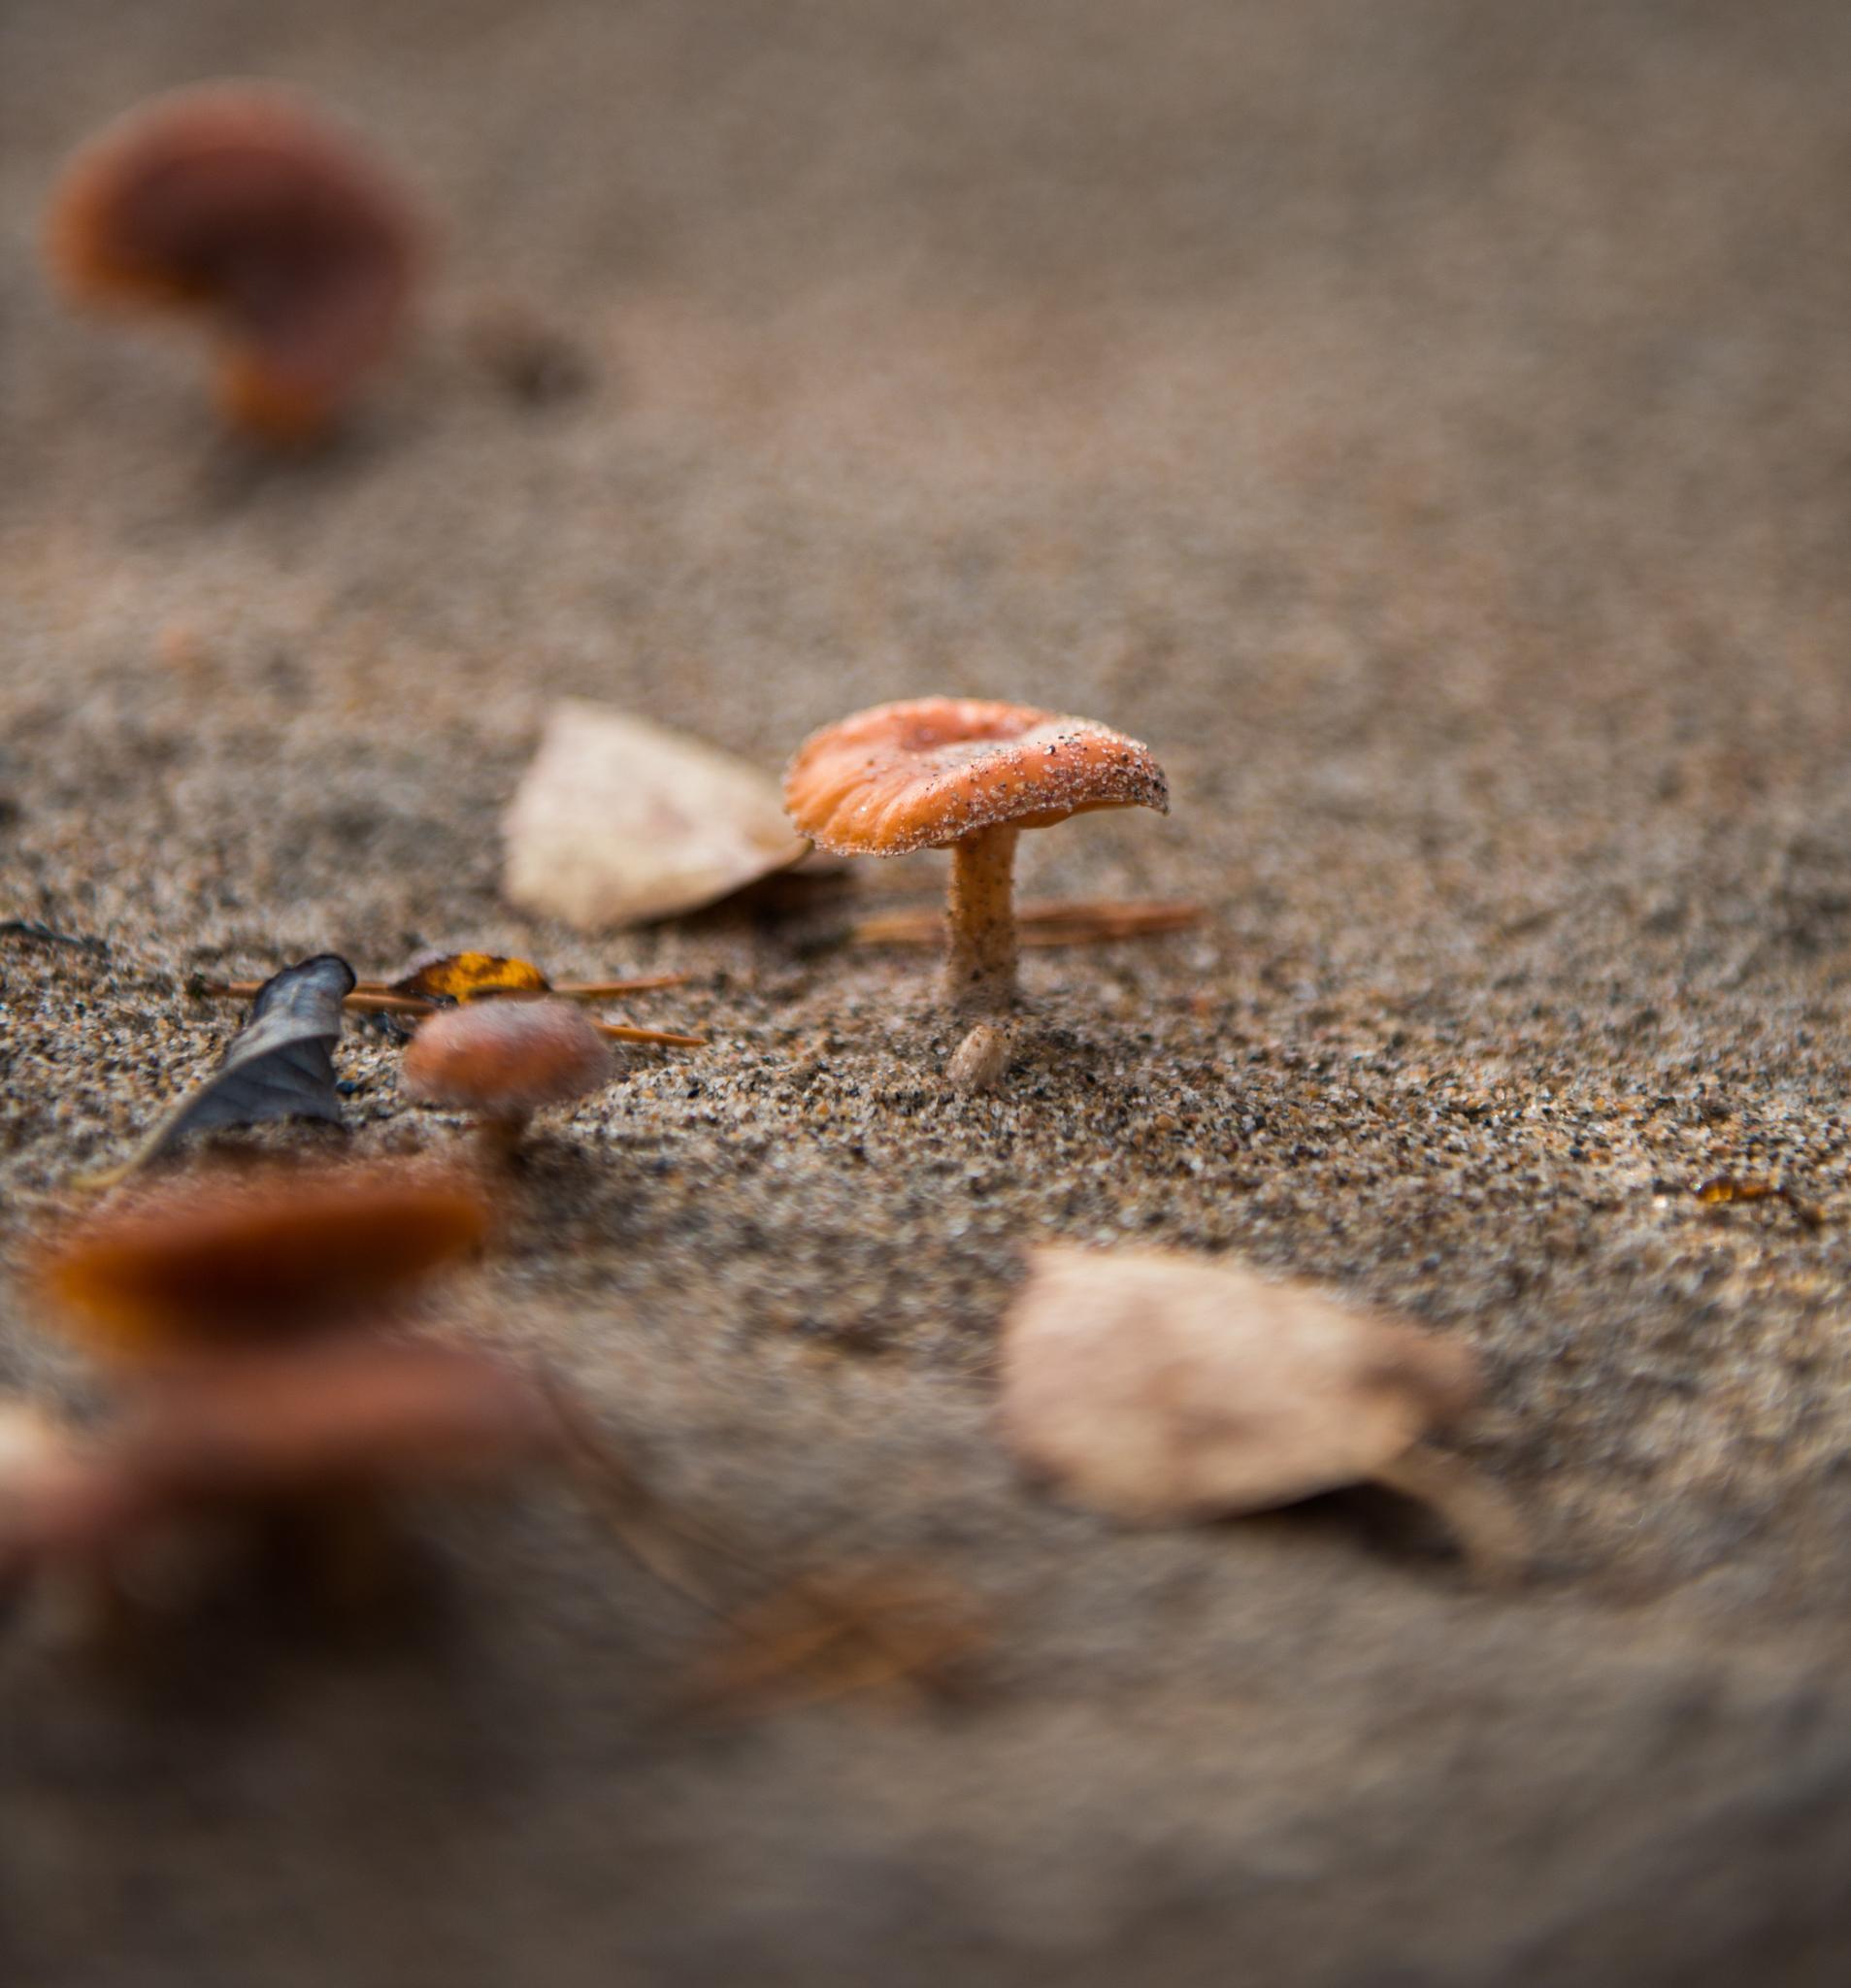 Sandy Mushroom by jokumzie